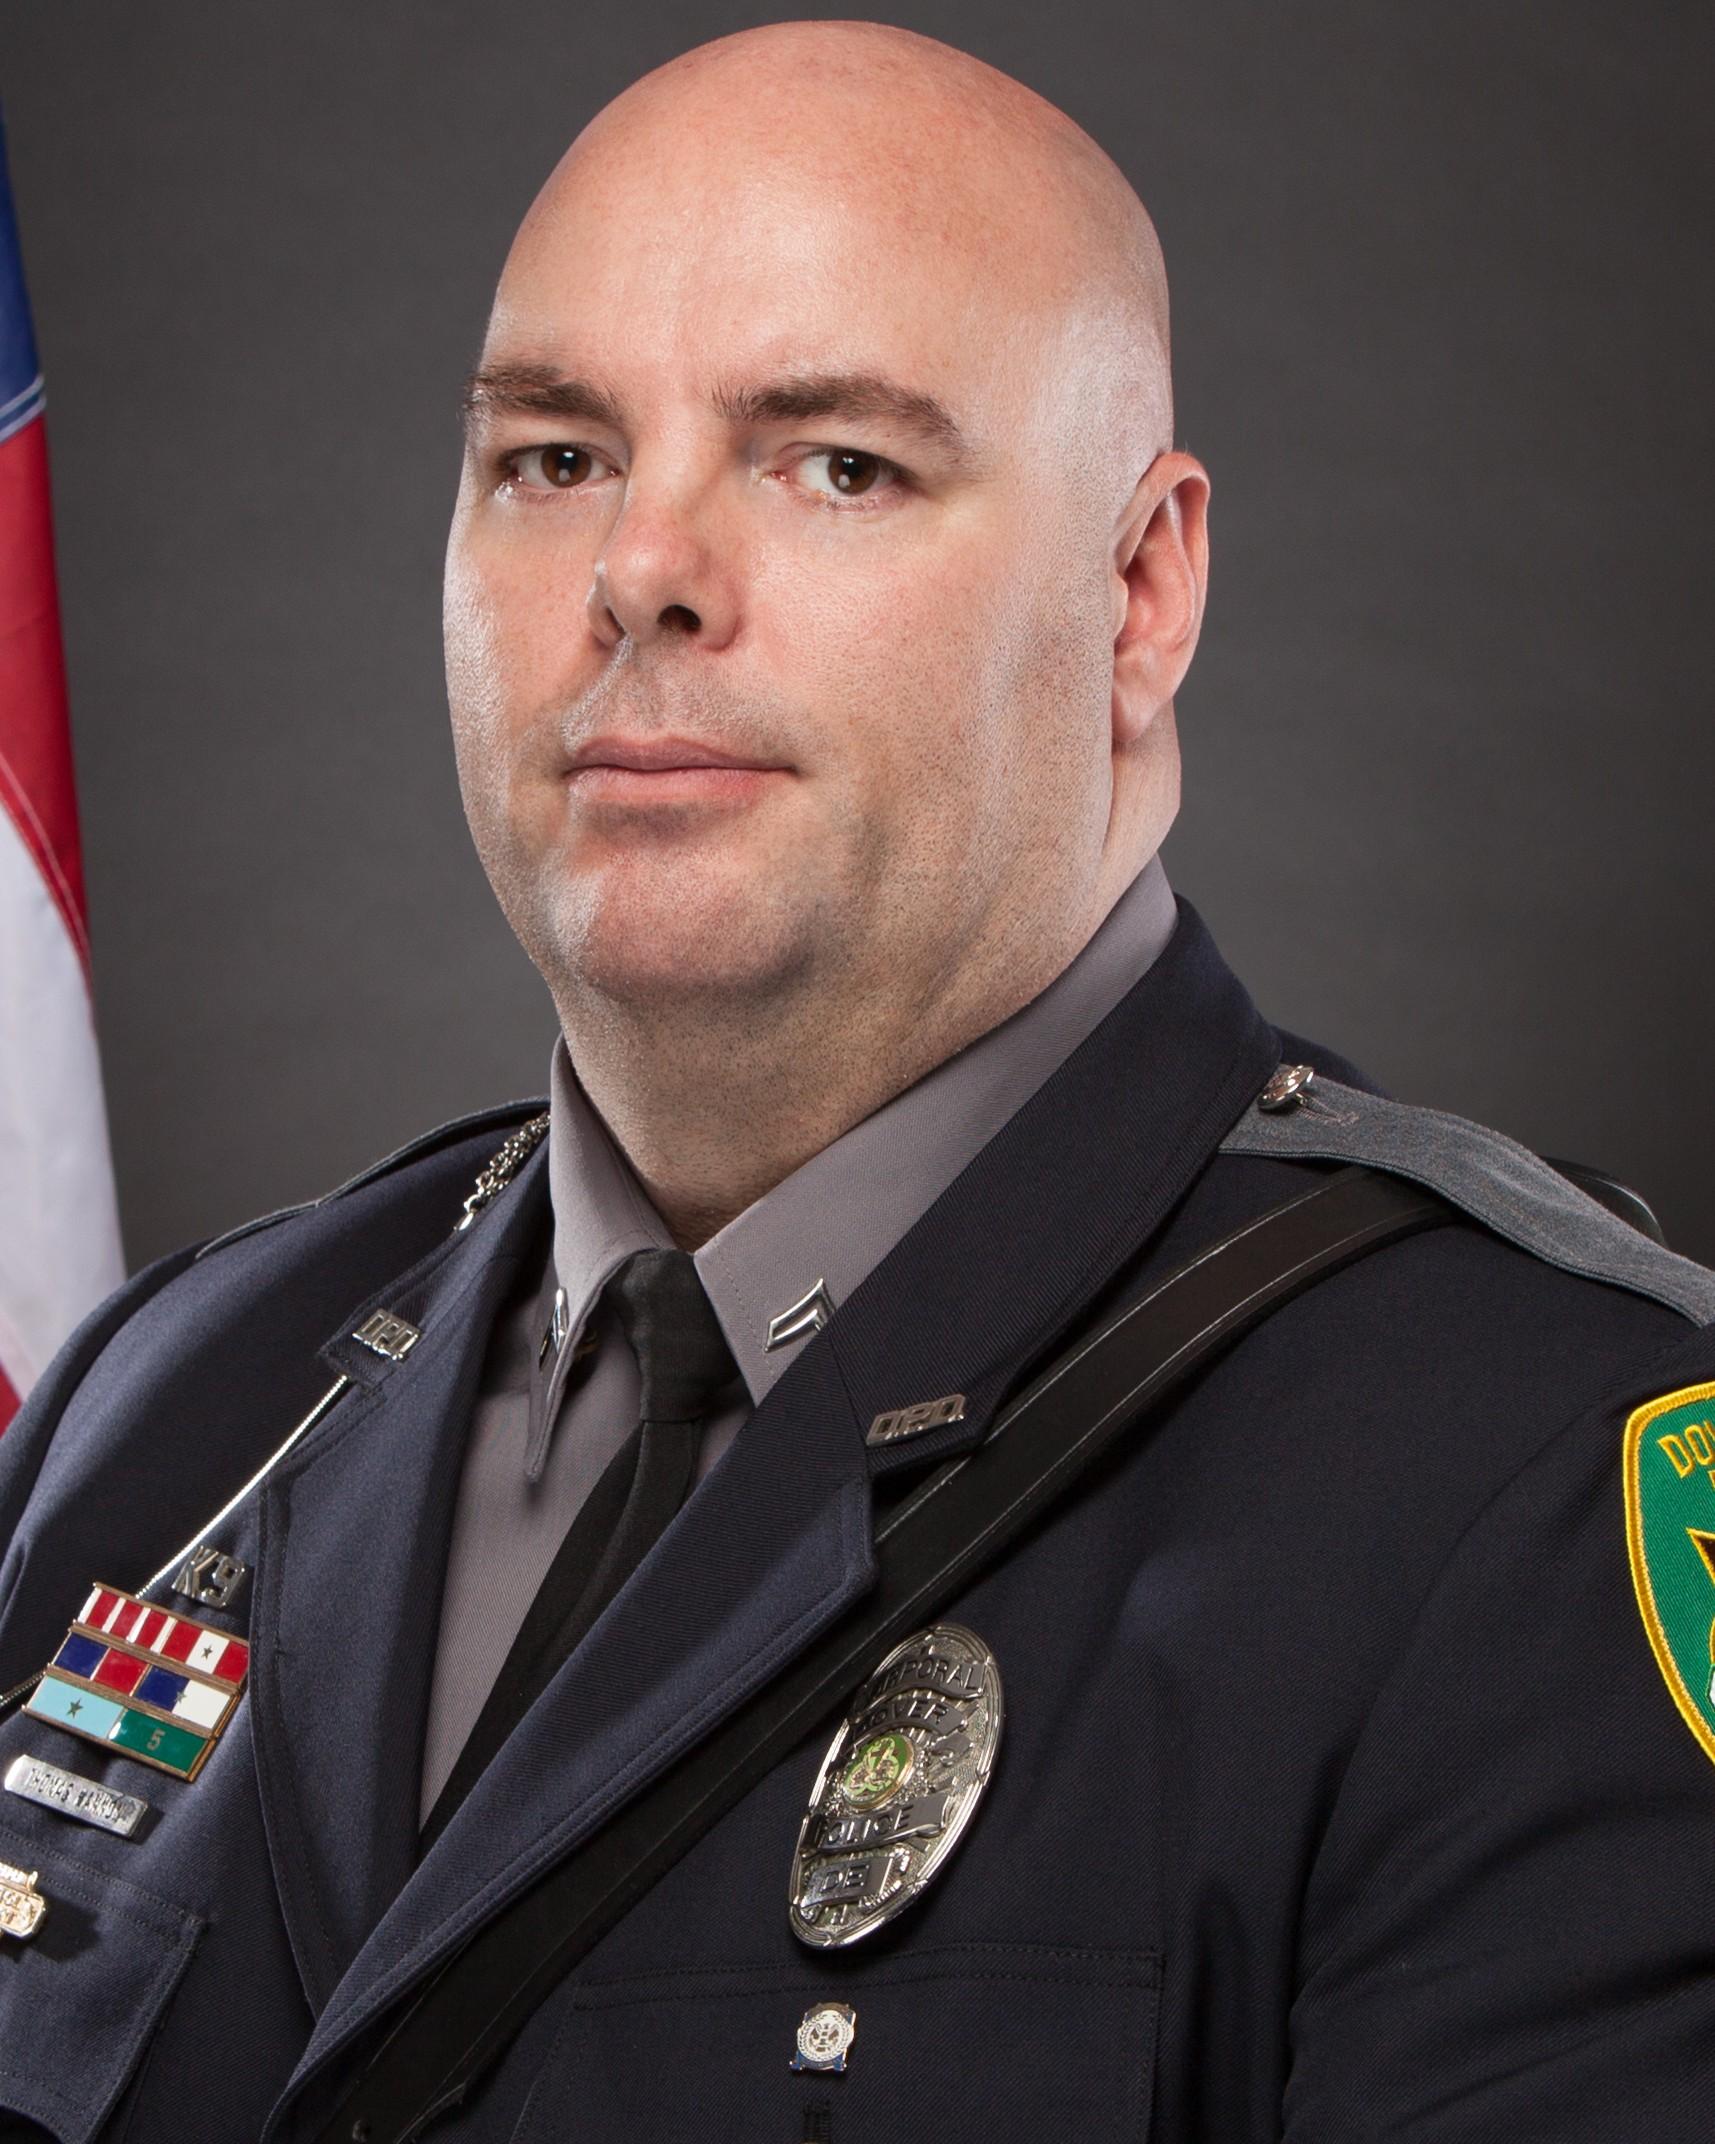 Corporal Thomas Hannon | Dover Police Department, Delaware